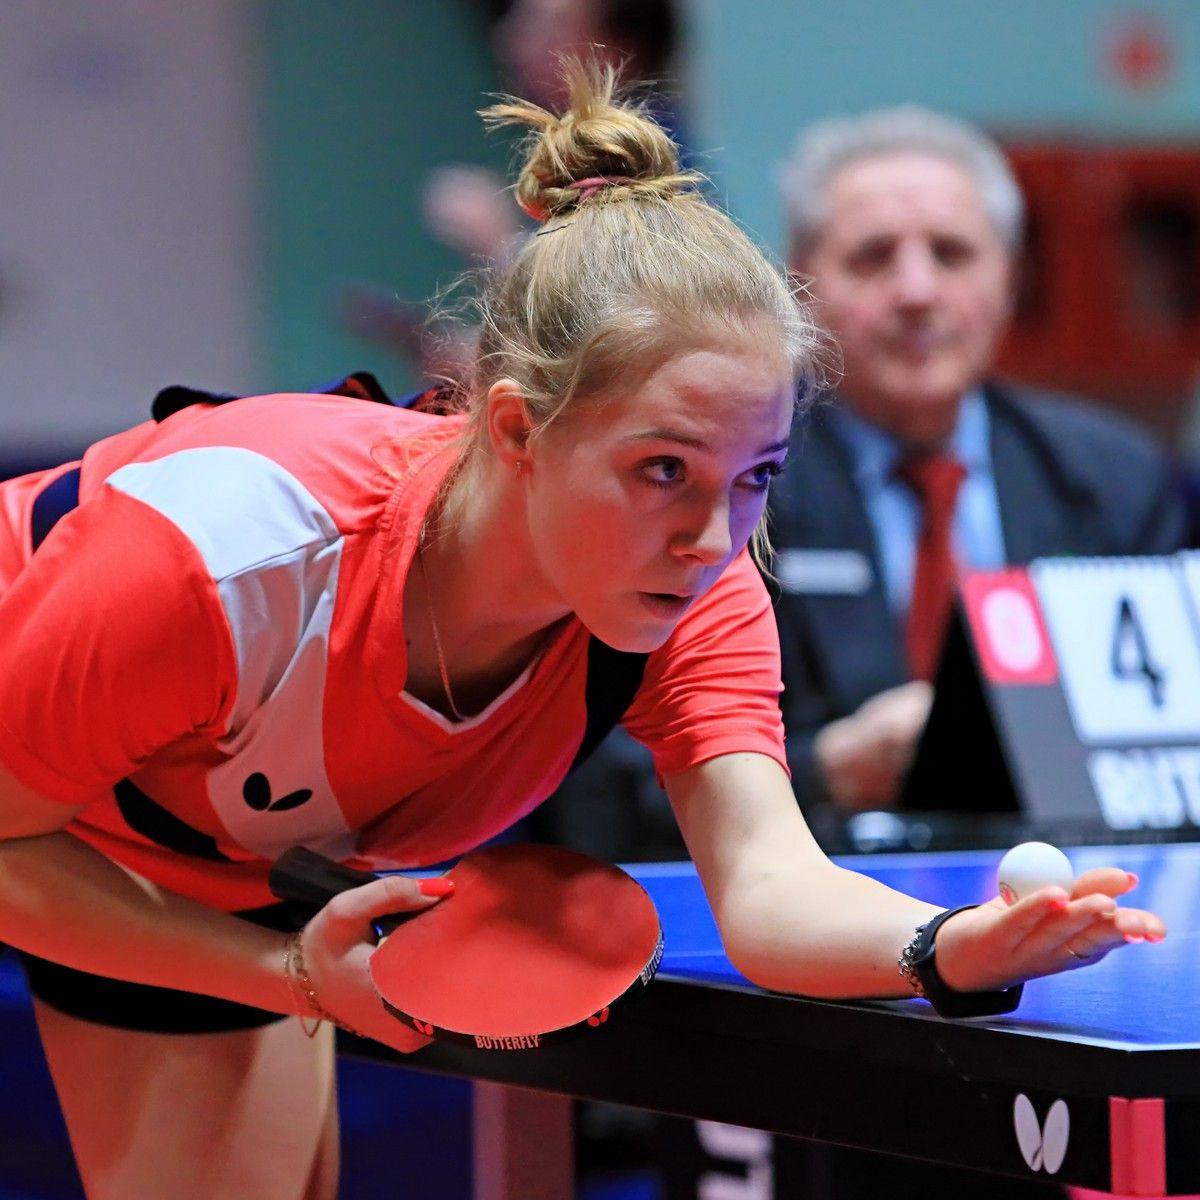 Анастасия Карпушина. настольный теннис пинг-понг спорт table tennis ping-pong sport girl